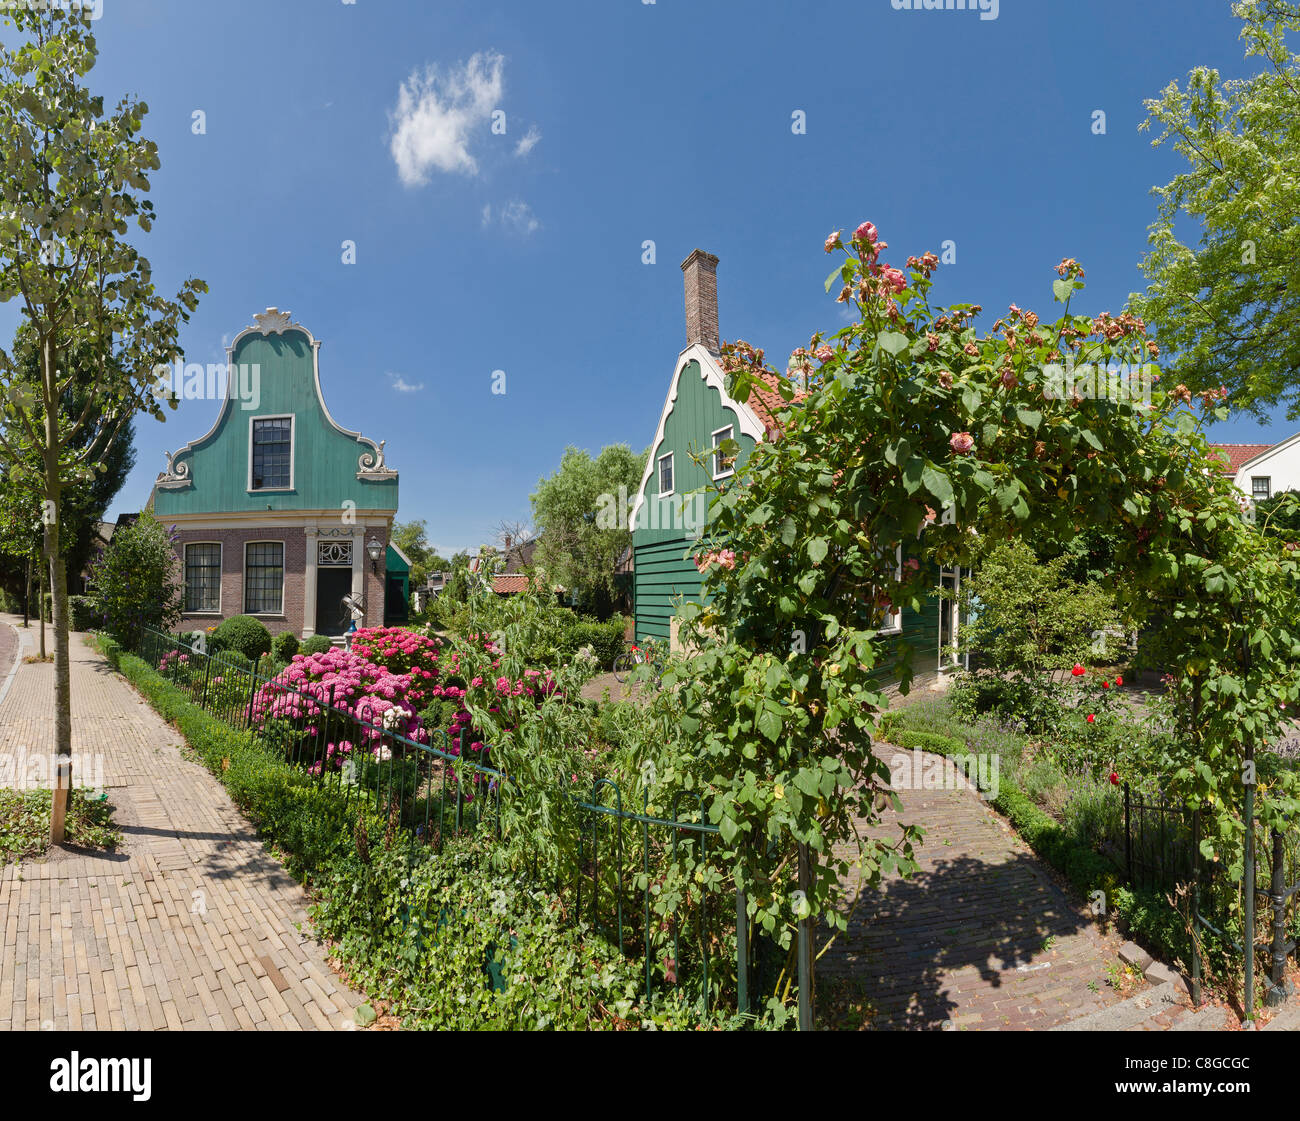 Netherlands, Europe, Holland, Zaandijk, Wooden houses with garden, city, village, flowers, summer, garden, - Stock Image